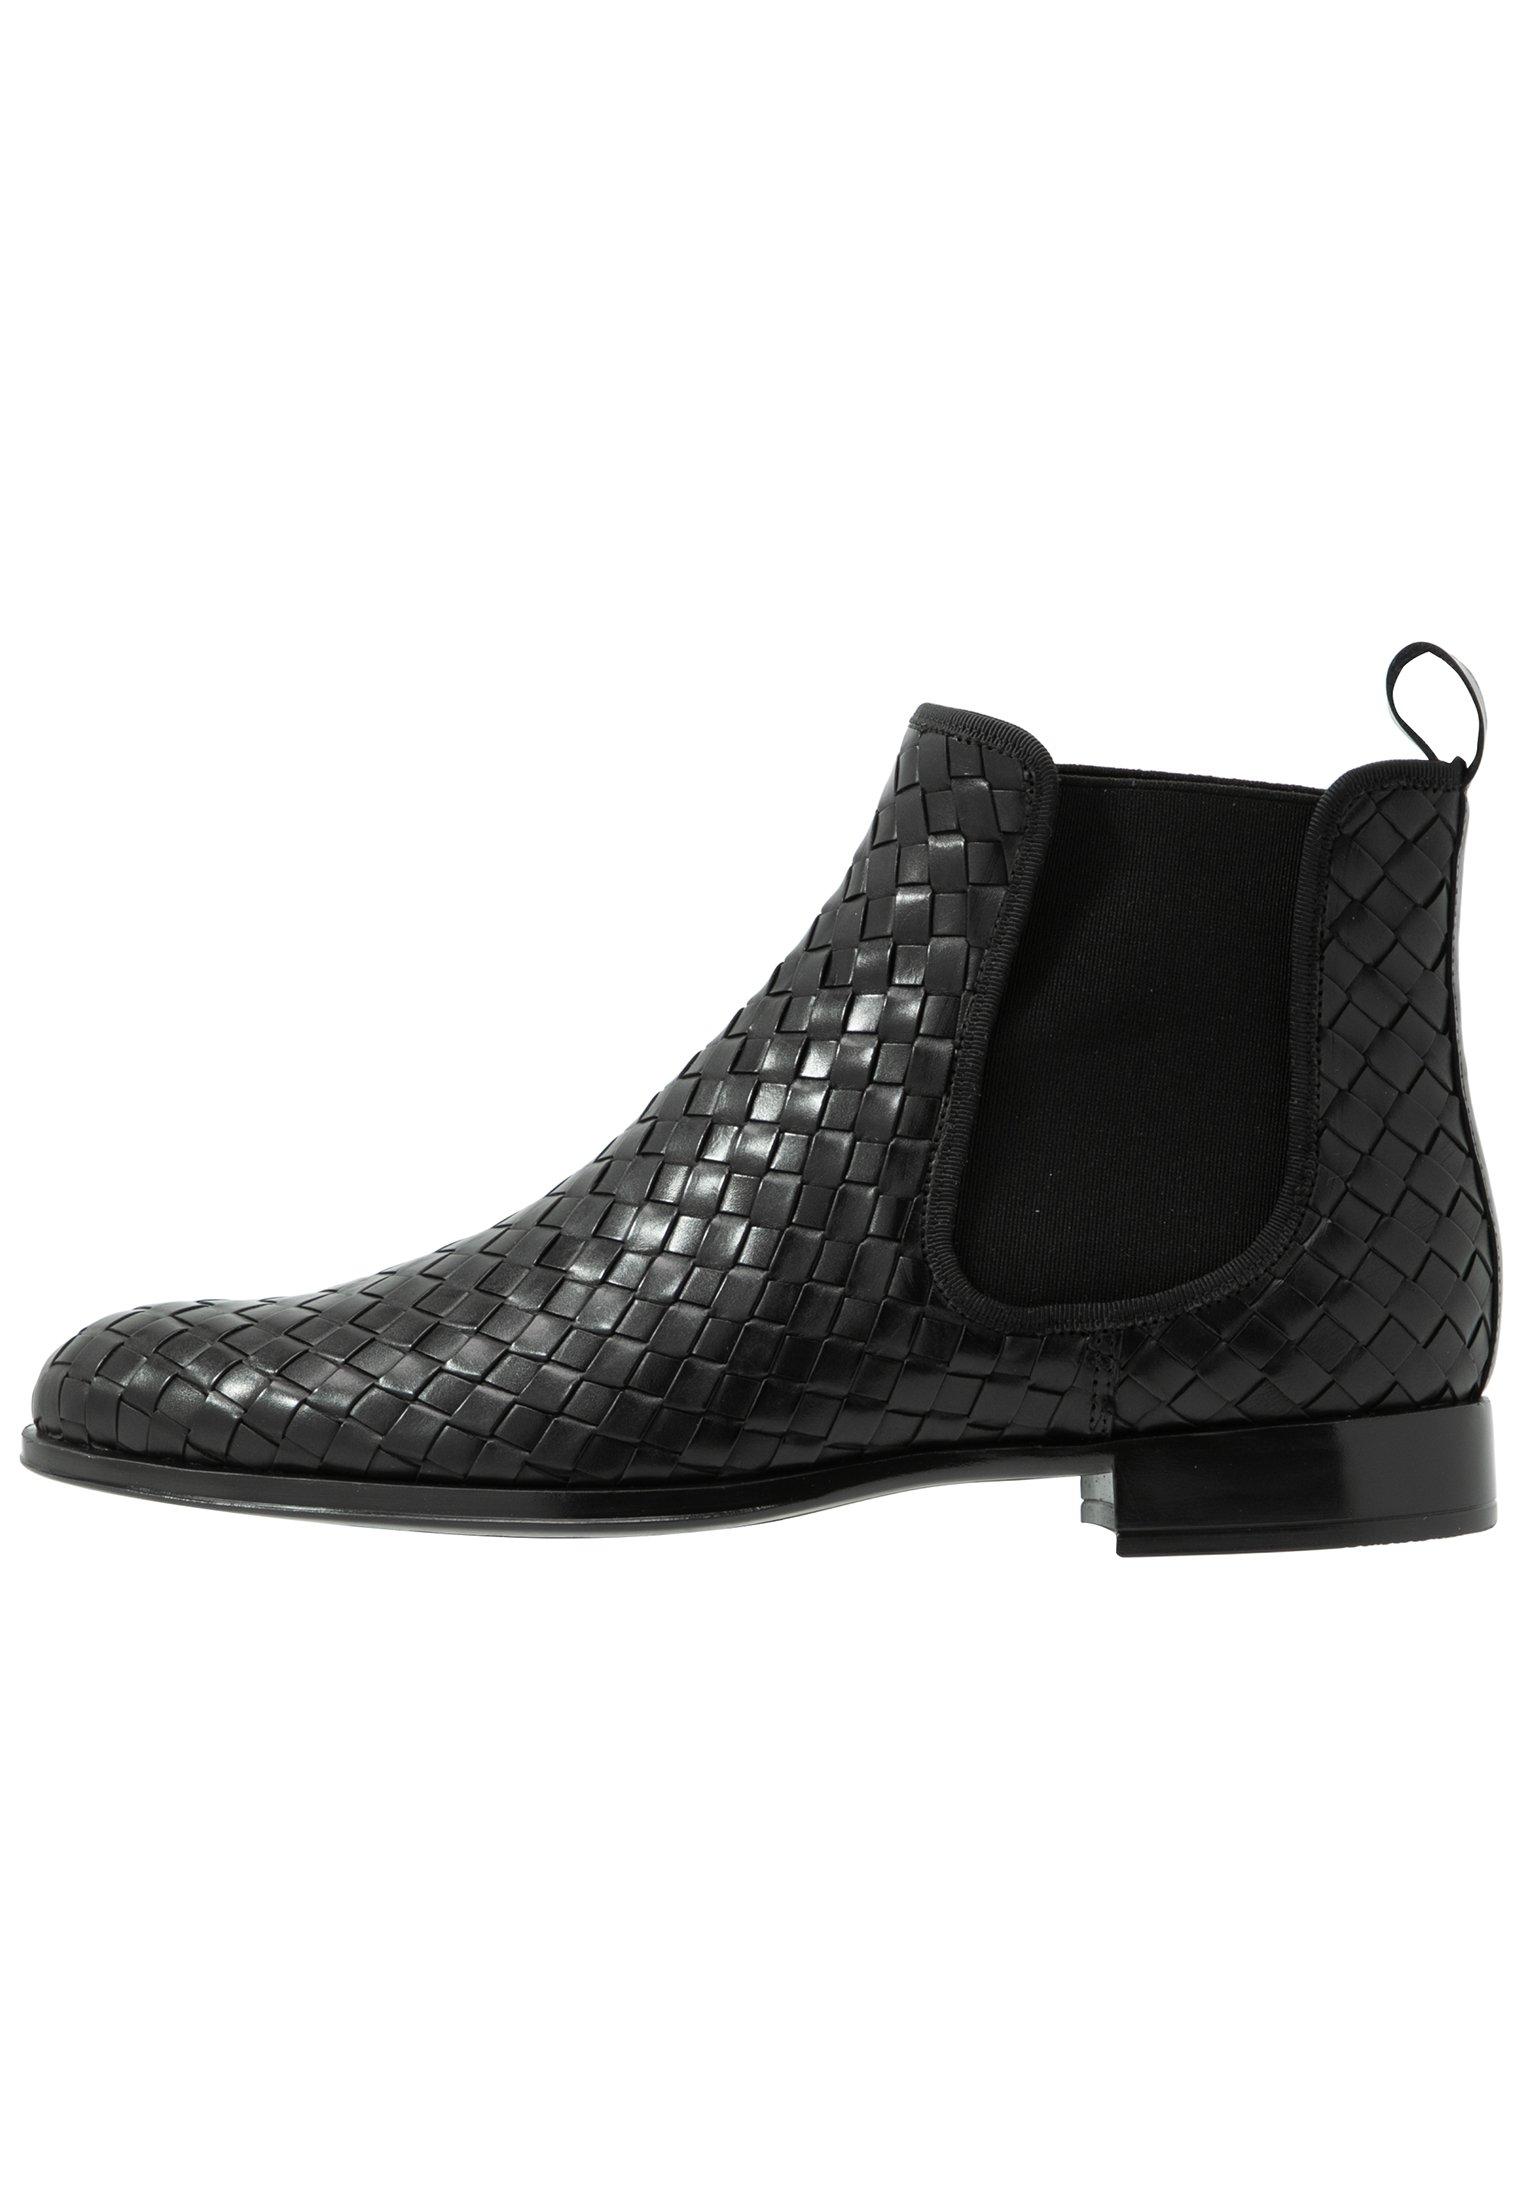 BECERRITO Ankelboots black